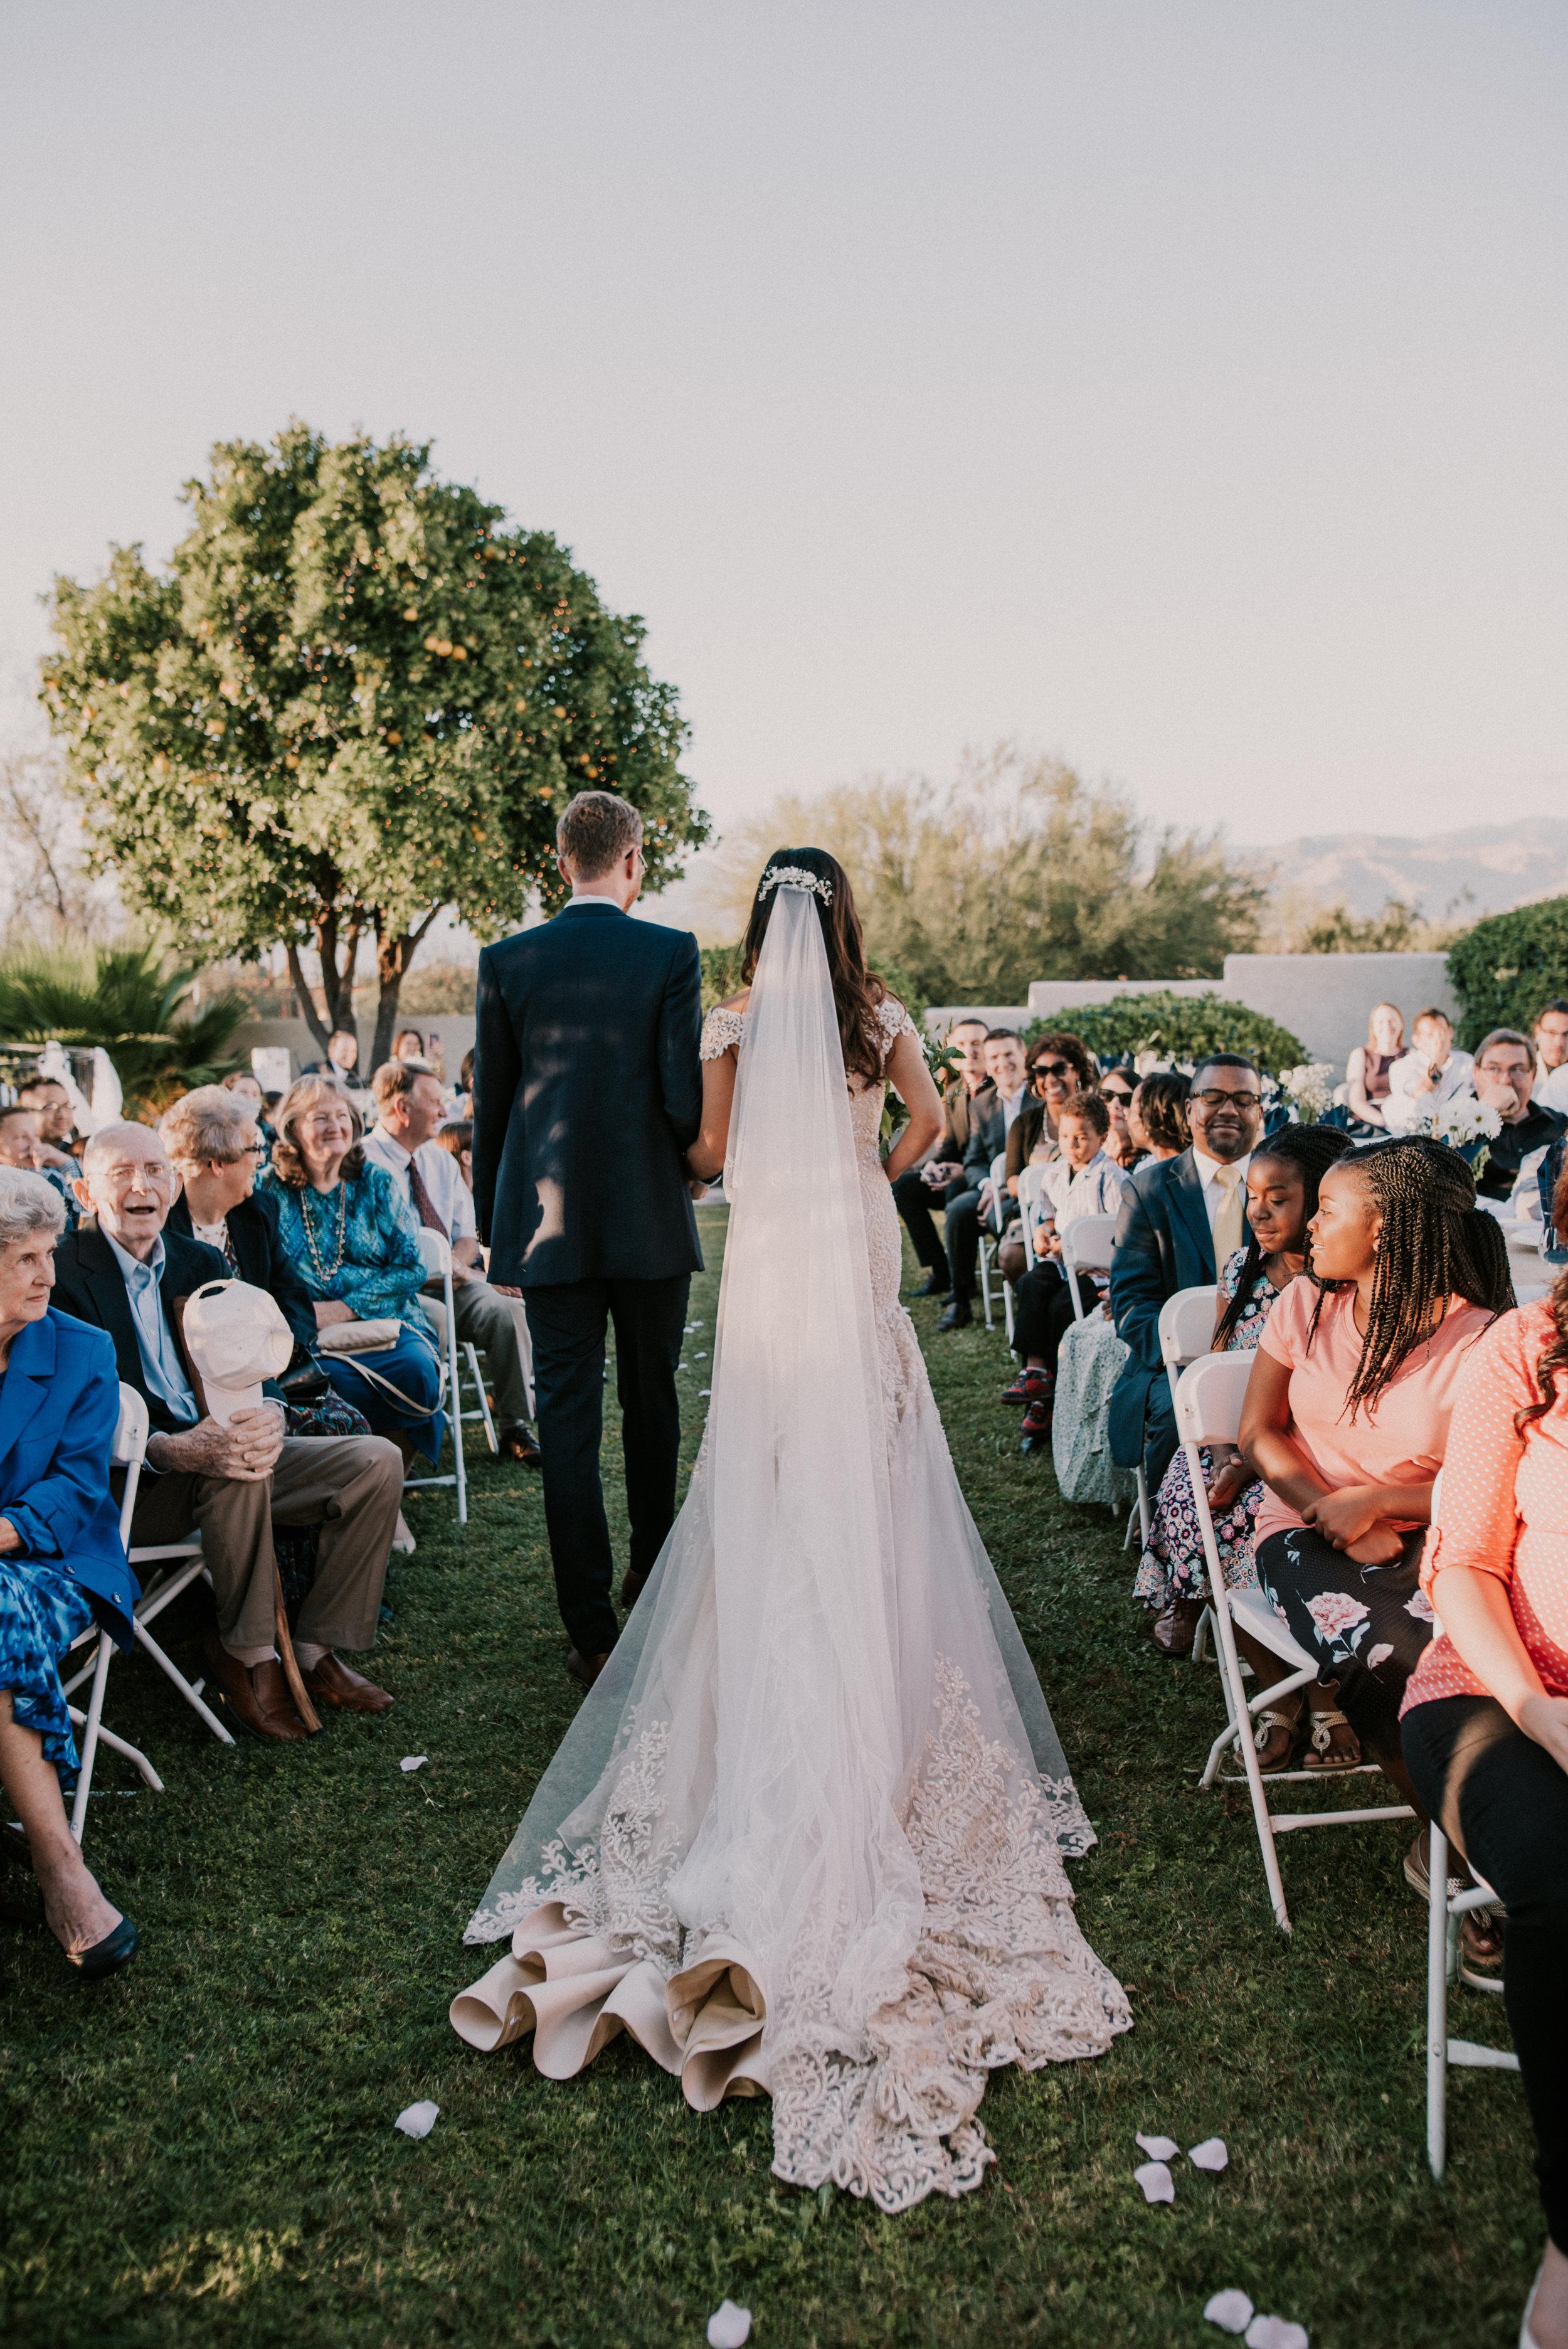 Tucson Intimate DIY Backyard Wedding_-19.jpg